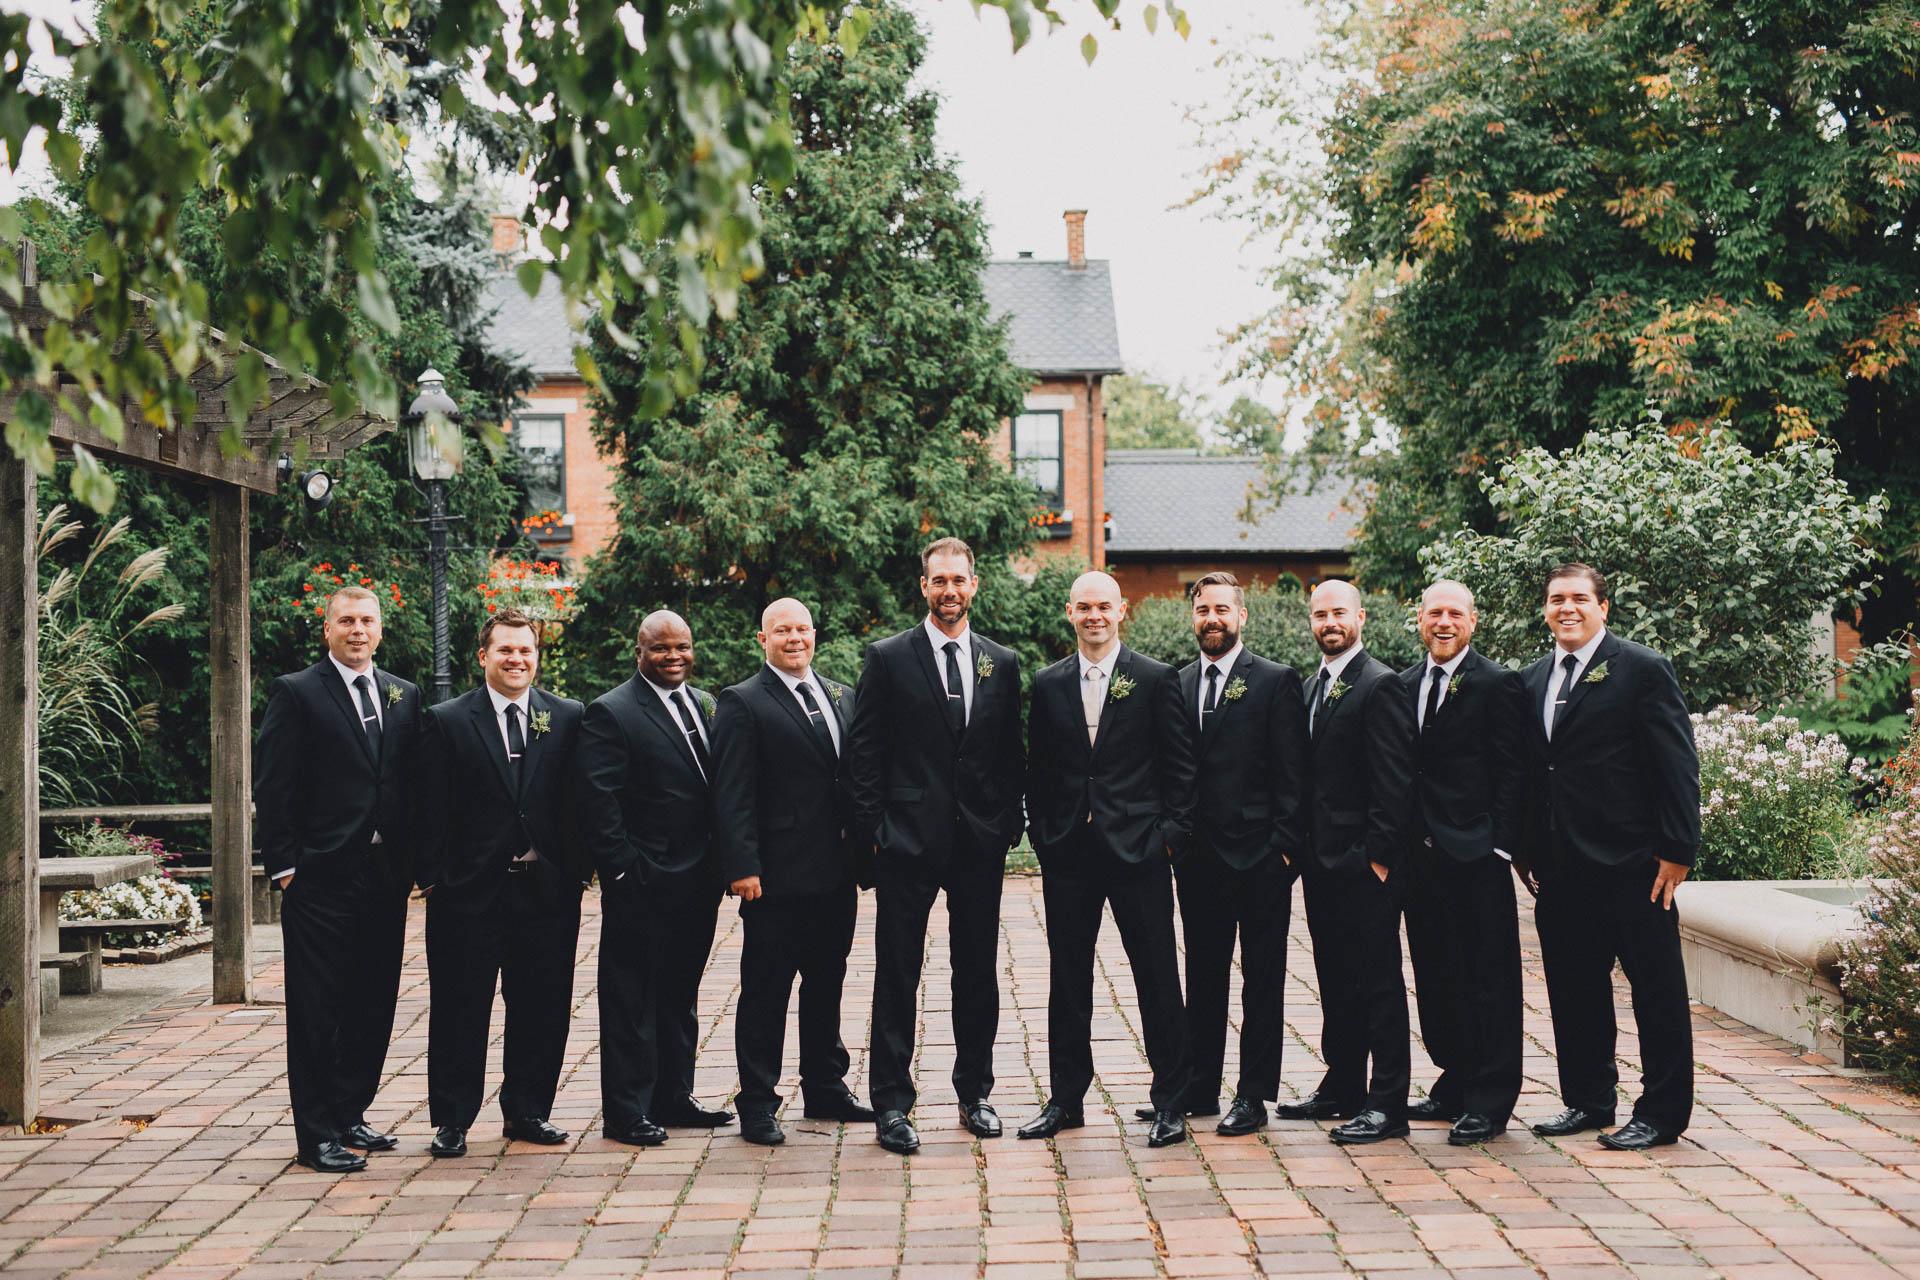 Taylor Greg Columbus Wedding Brewmasters Gate 17 German Village.jpg